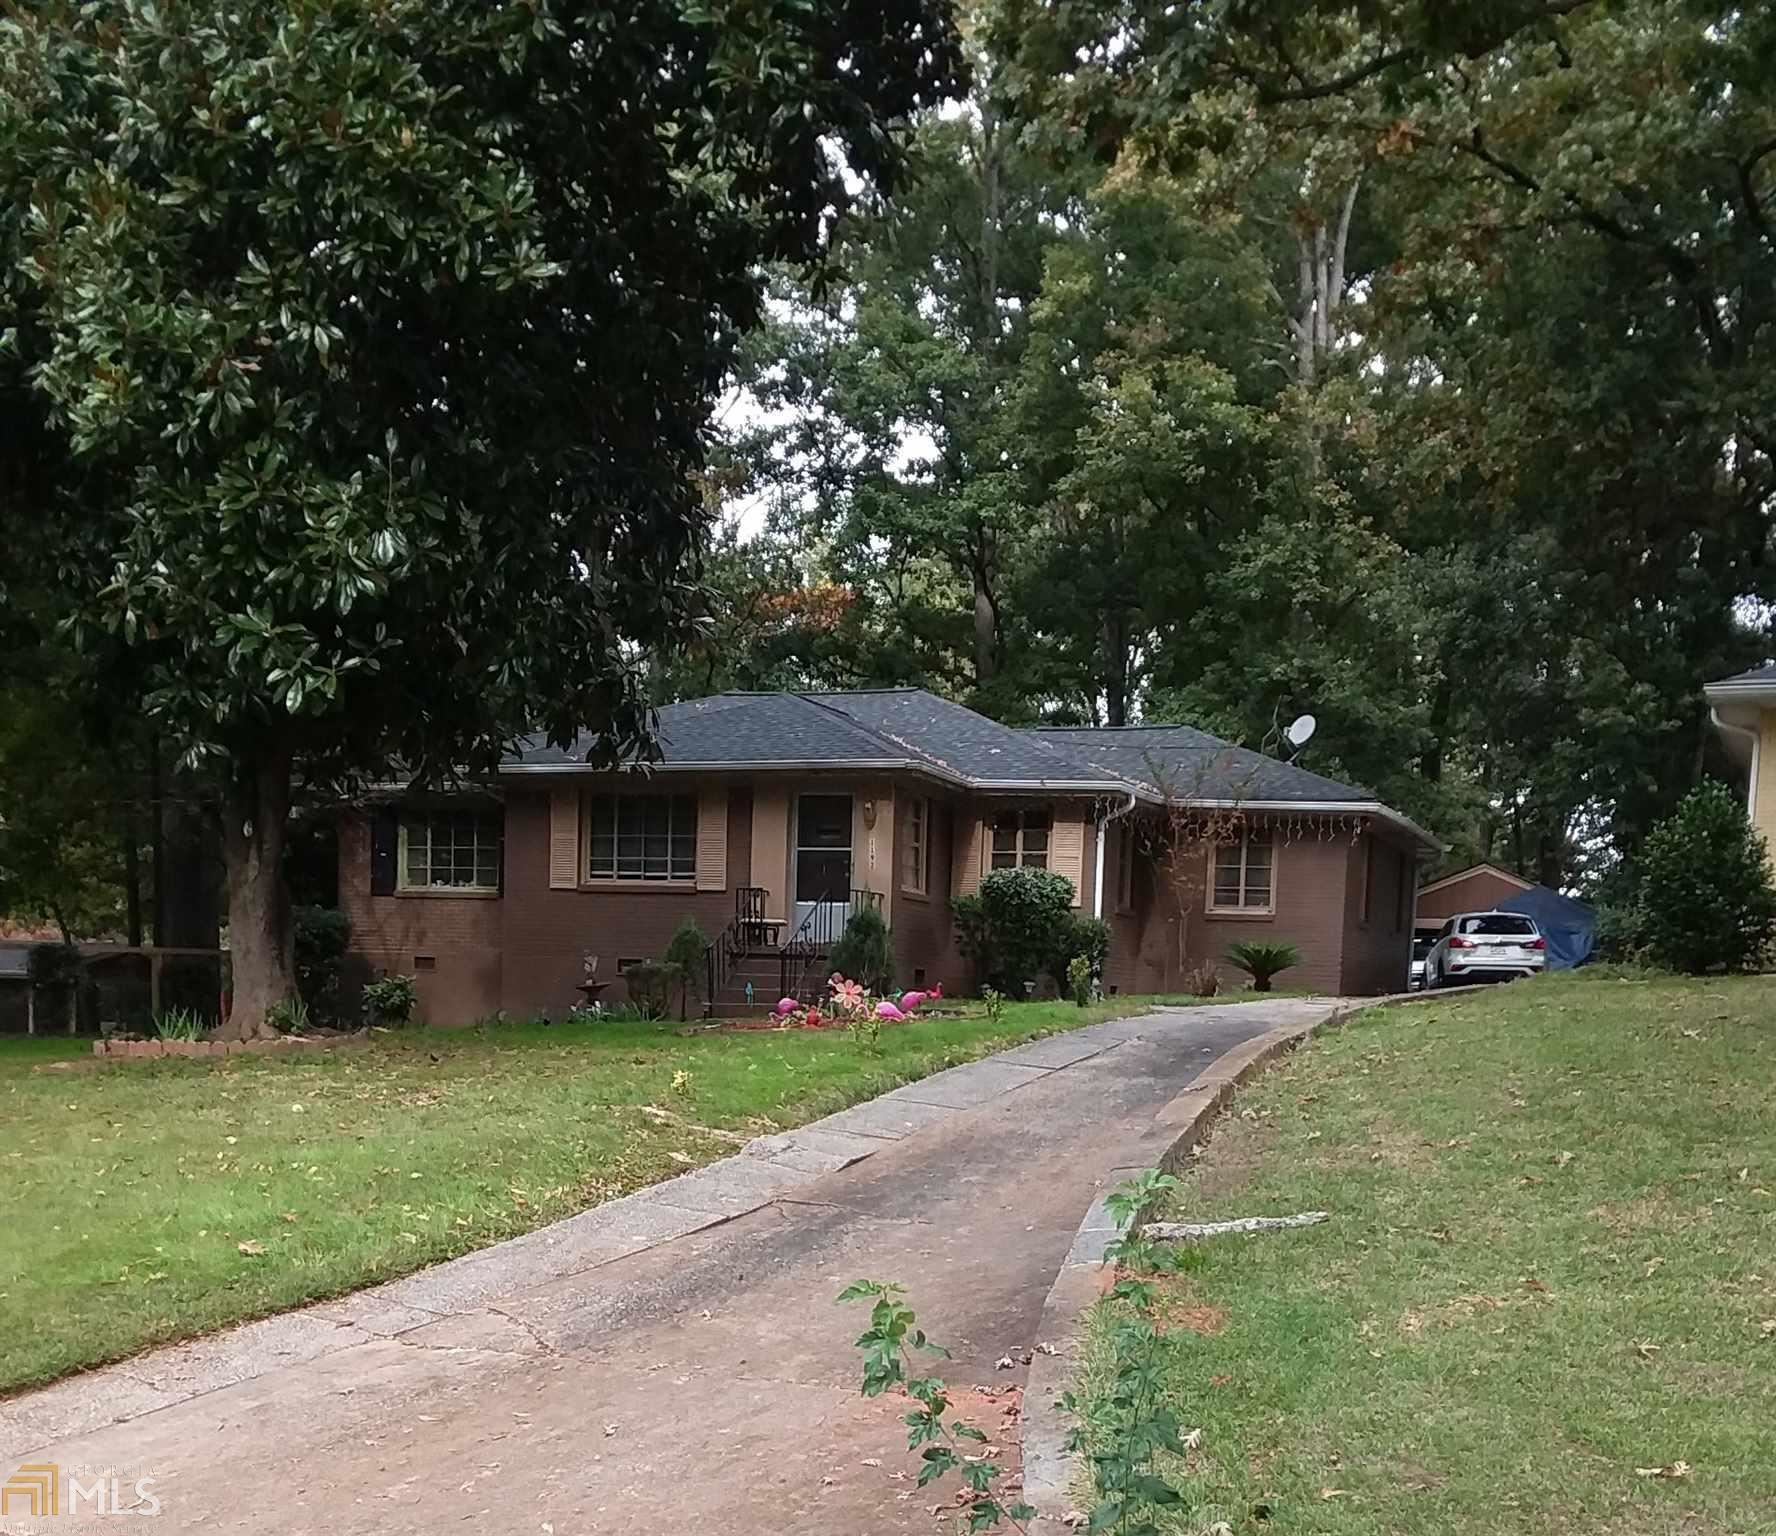 1192 SE Crestwood Dr, Atlanta, GA 30316 - MLS#: 8688652